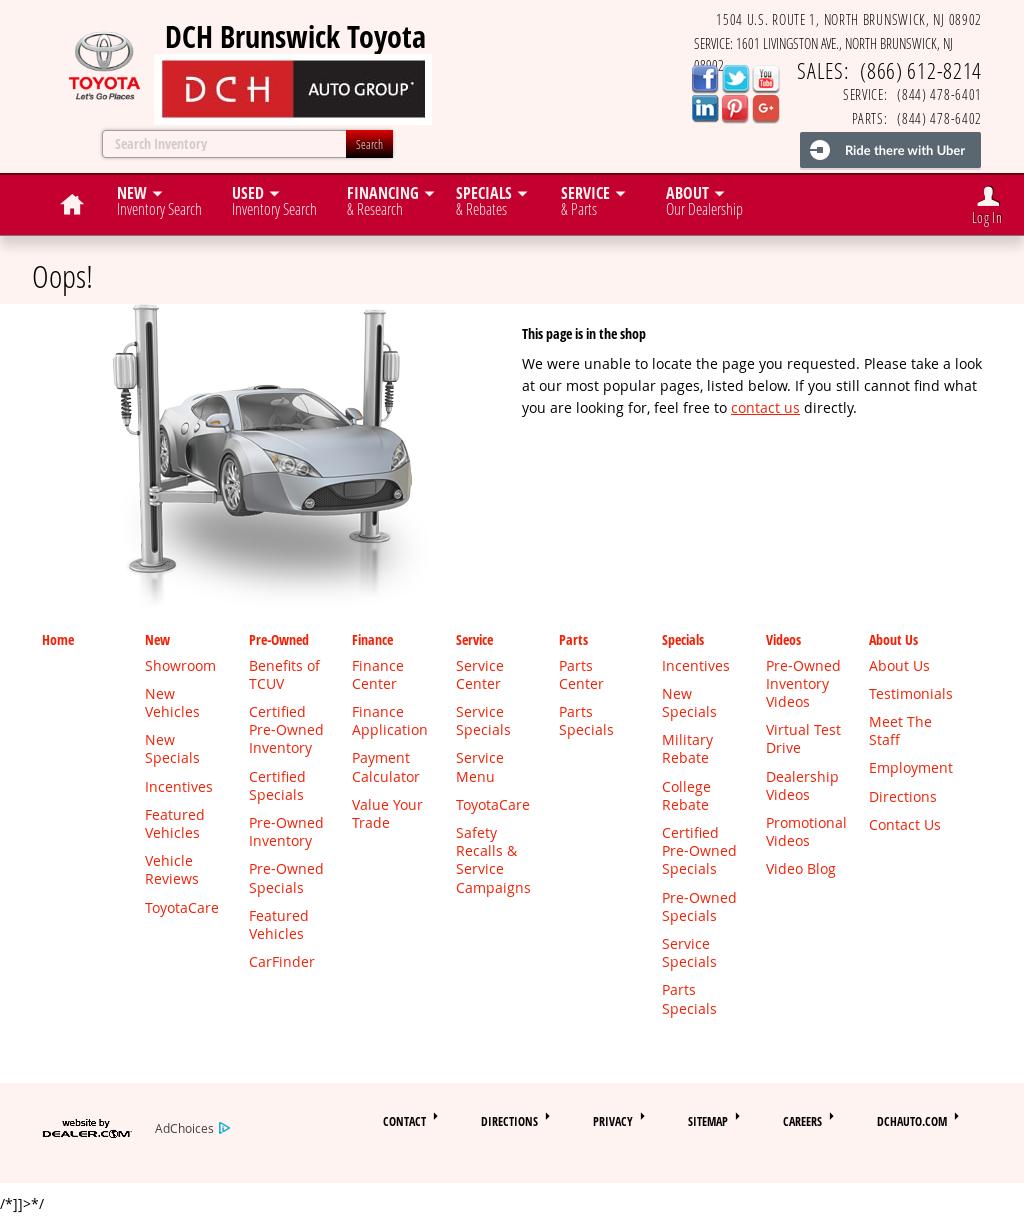 Dch Brunswick Toyota Website History